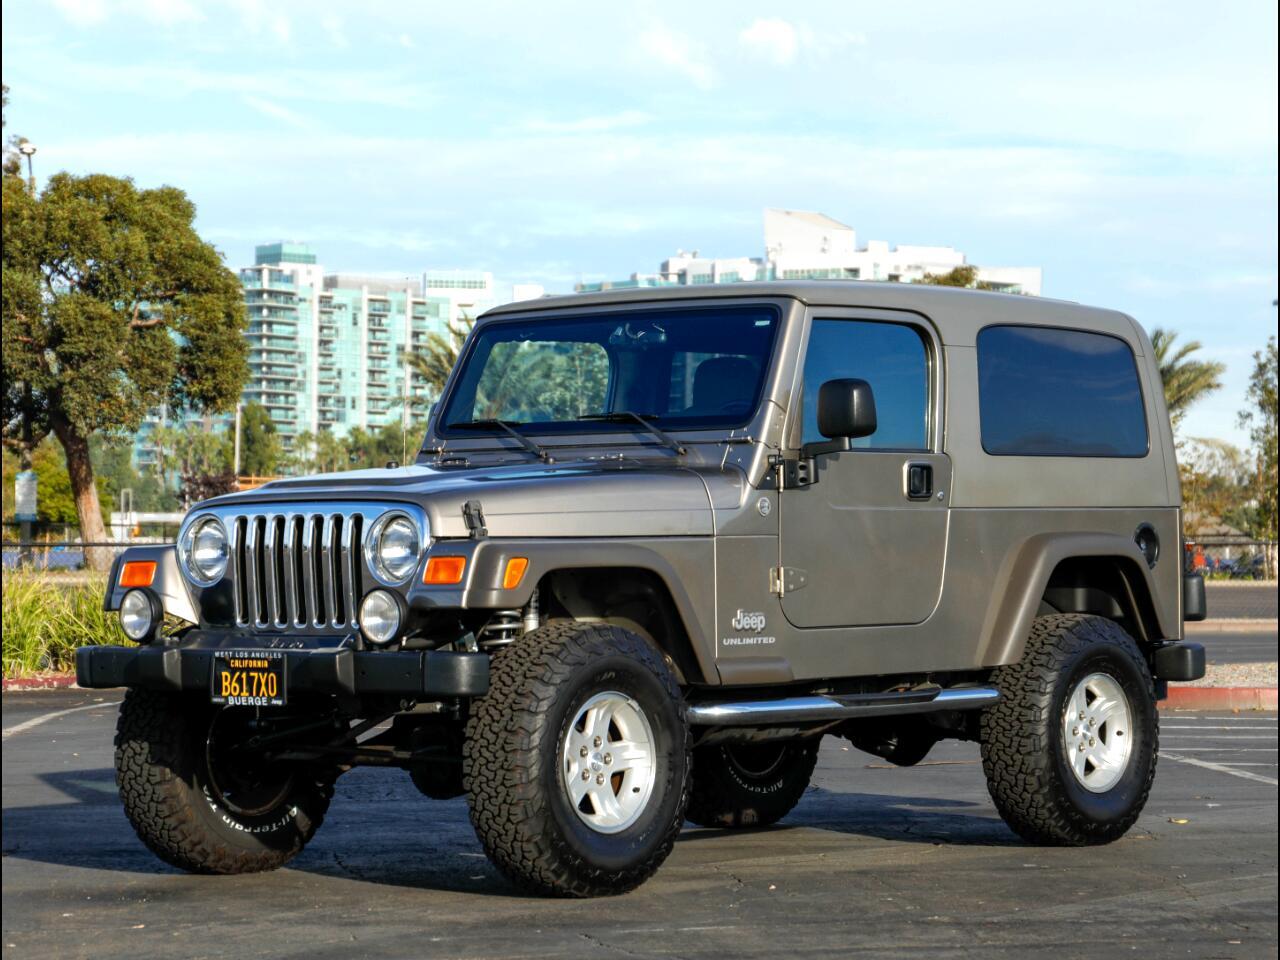 2005 Jeep Wrangler 2dr Unlimited LWB